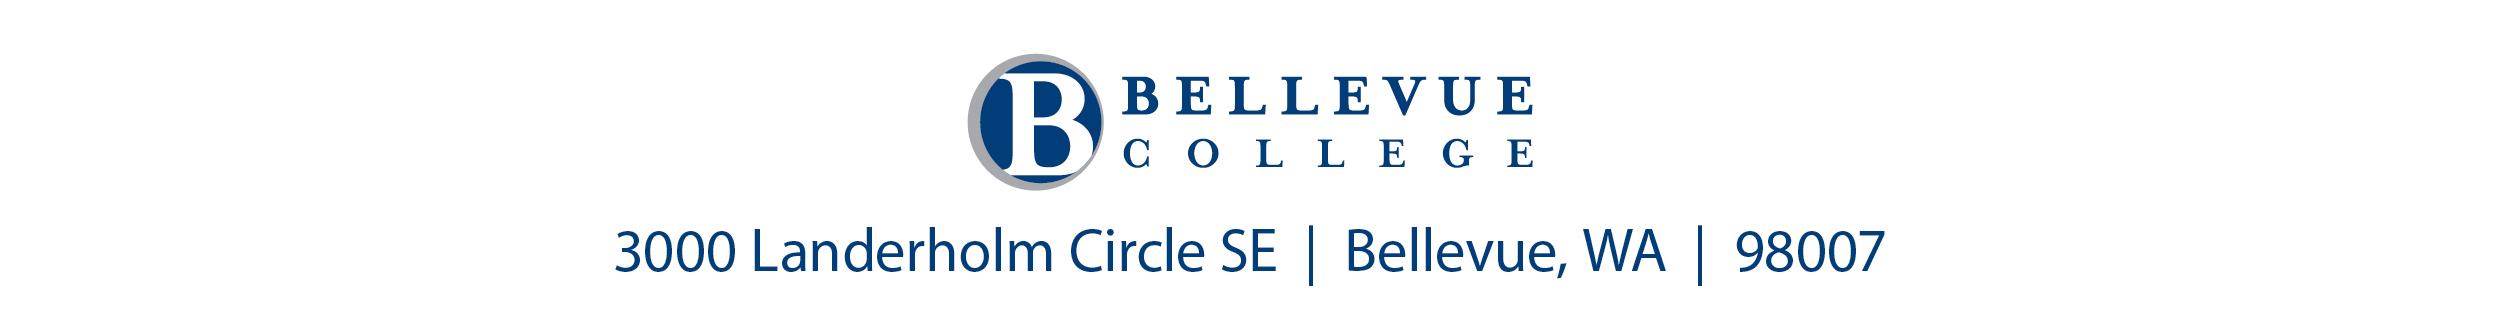 Bellevue College, 3000 Landerholm Circle SE, Bellevue, WA, 98007